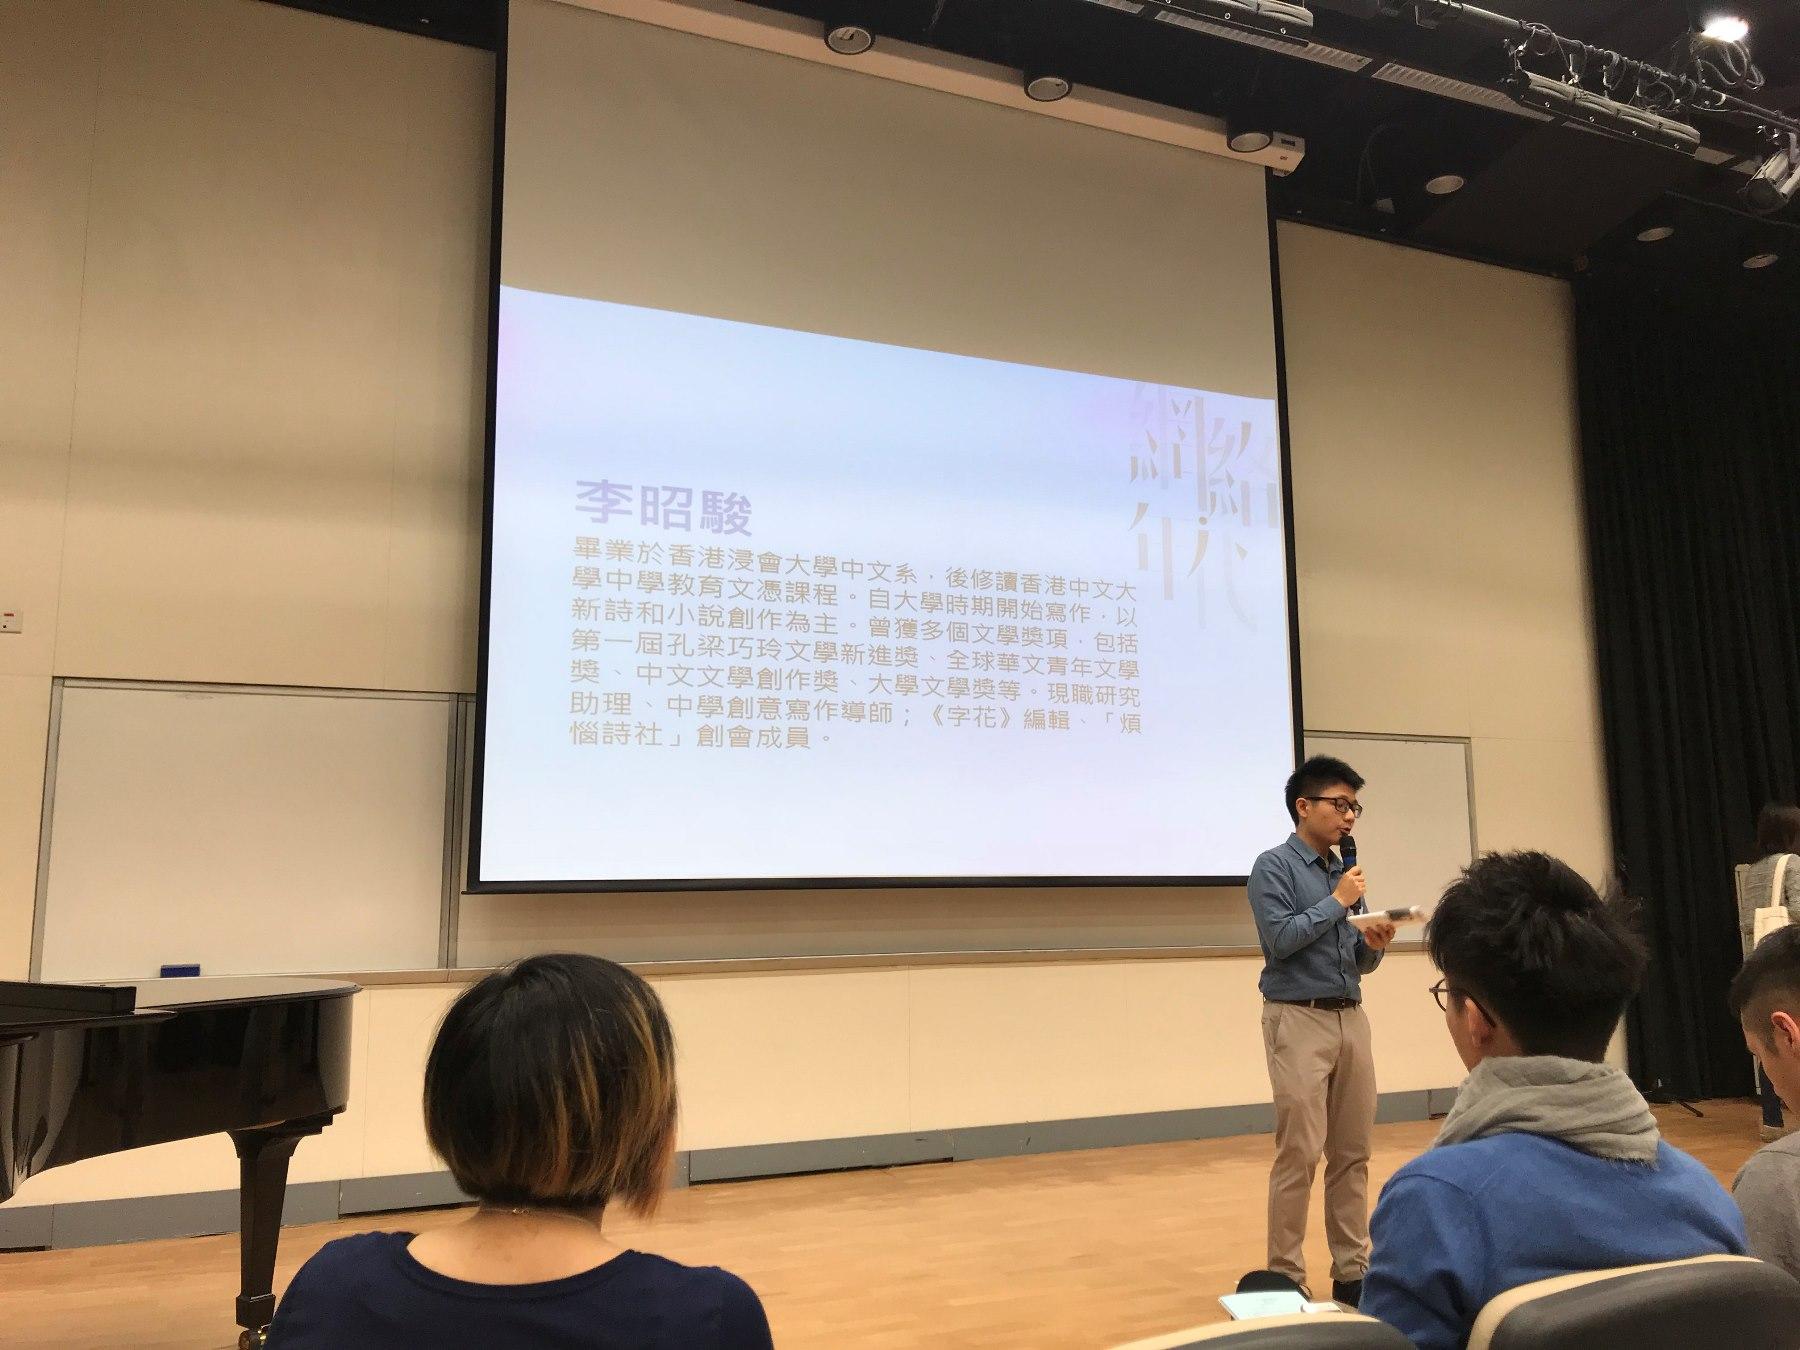 https://www.npc.edu.hk/sites/default/files/img_6186.jpeg